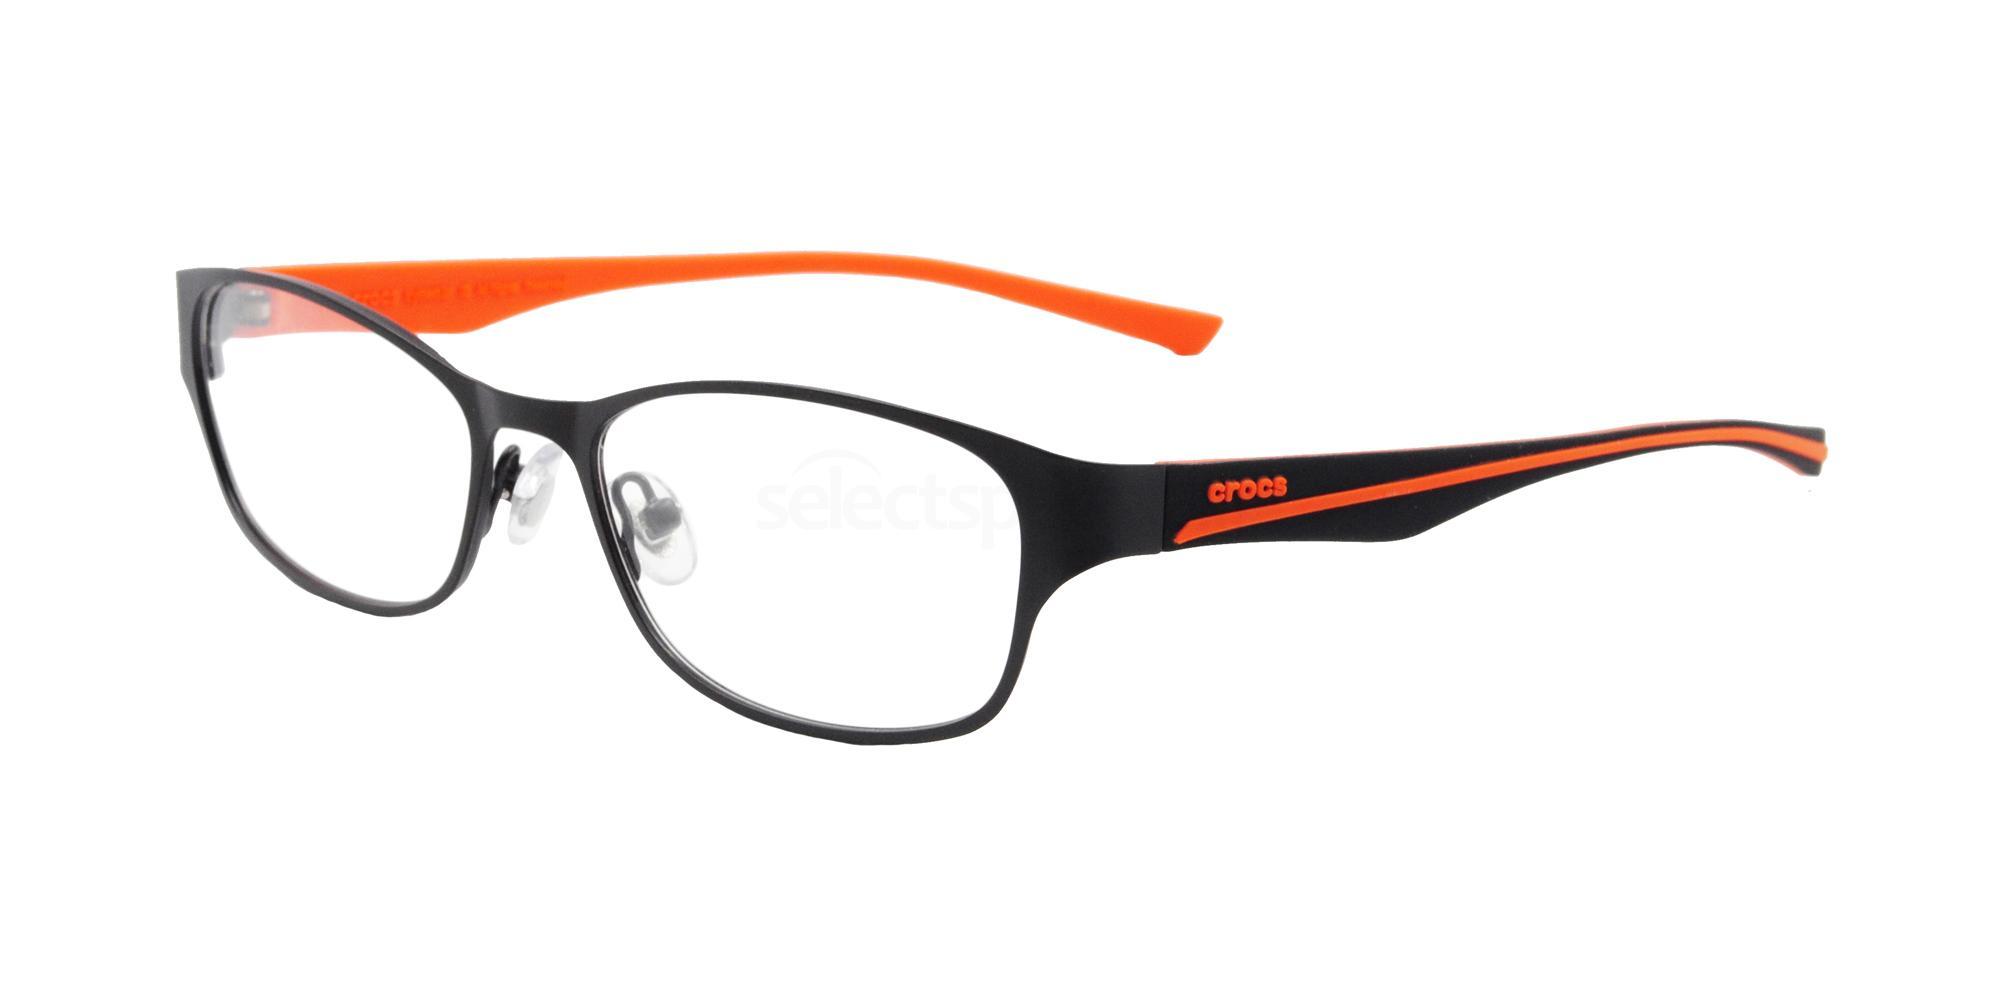 20OE CF3015 Glasses, Crocs Eyewear